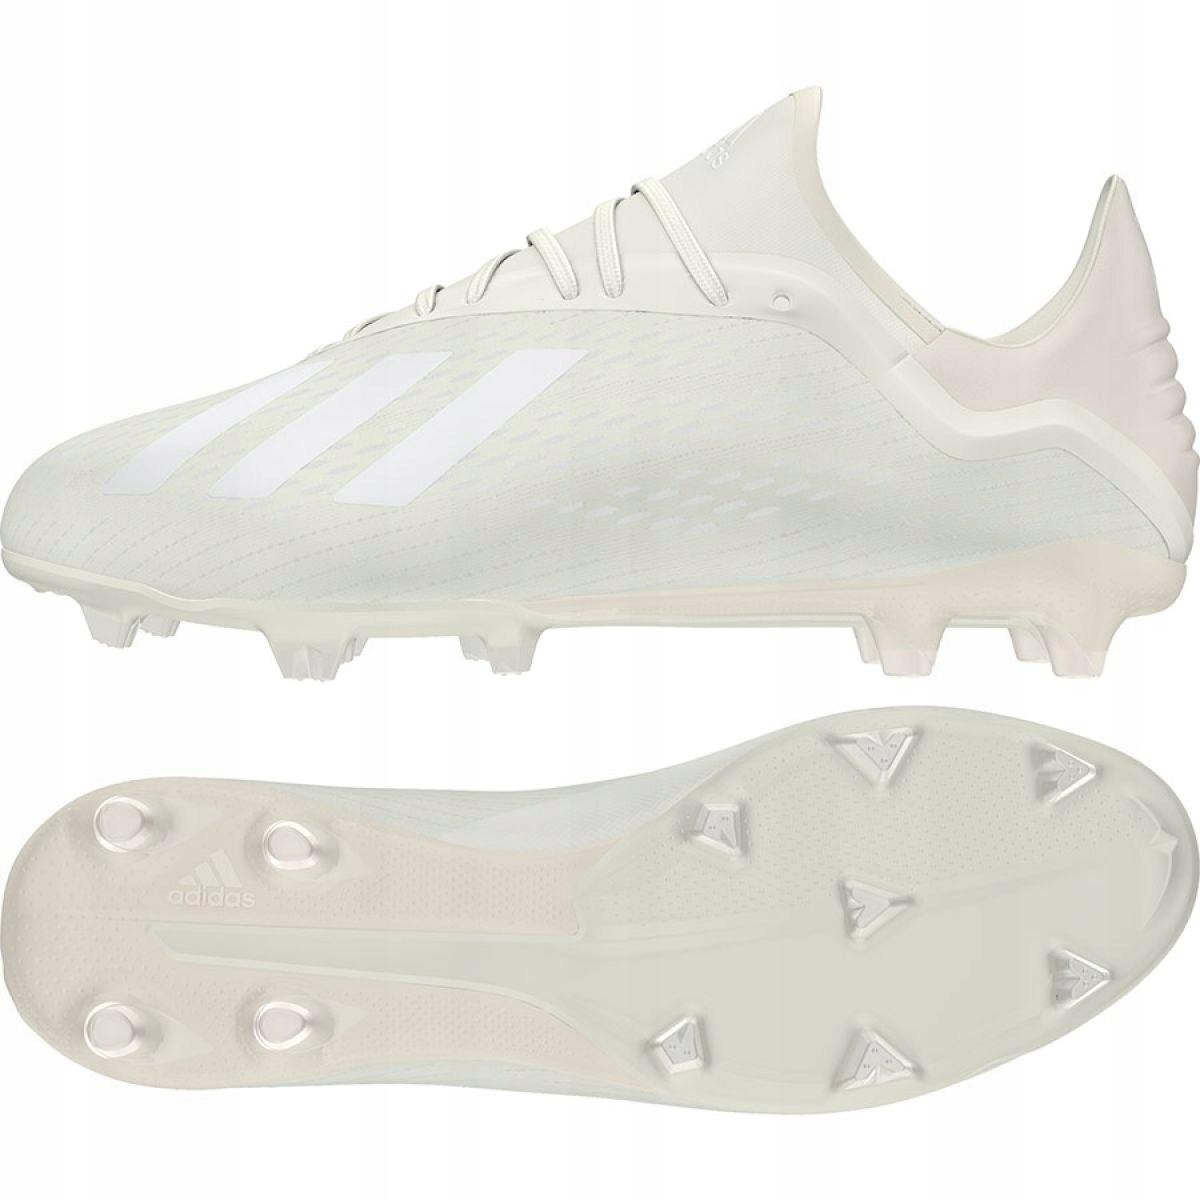 518816f36f2c Buty piłkarskie adidas X 18.2 FG M DB2181 41 1 3 - 7593005914 ...